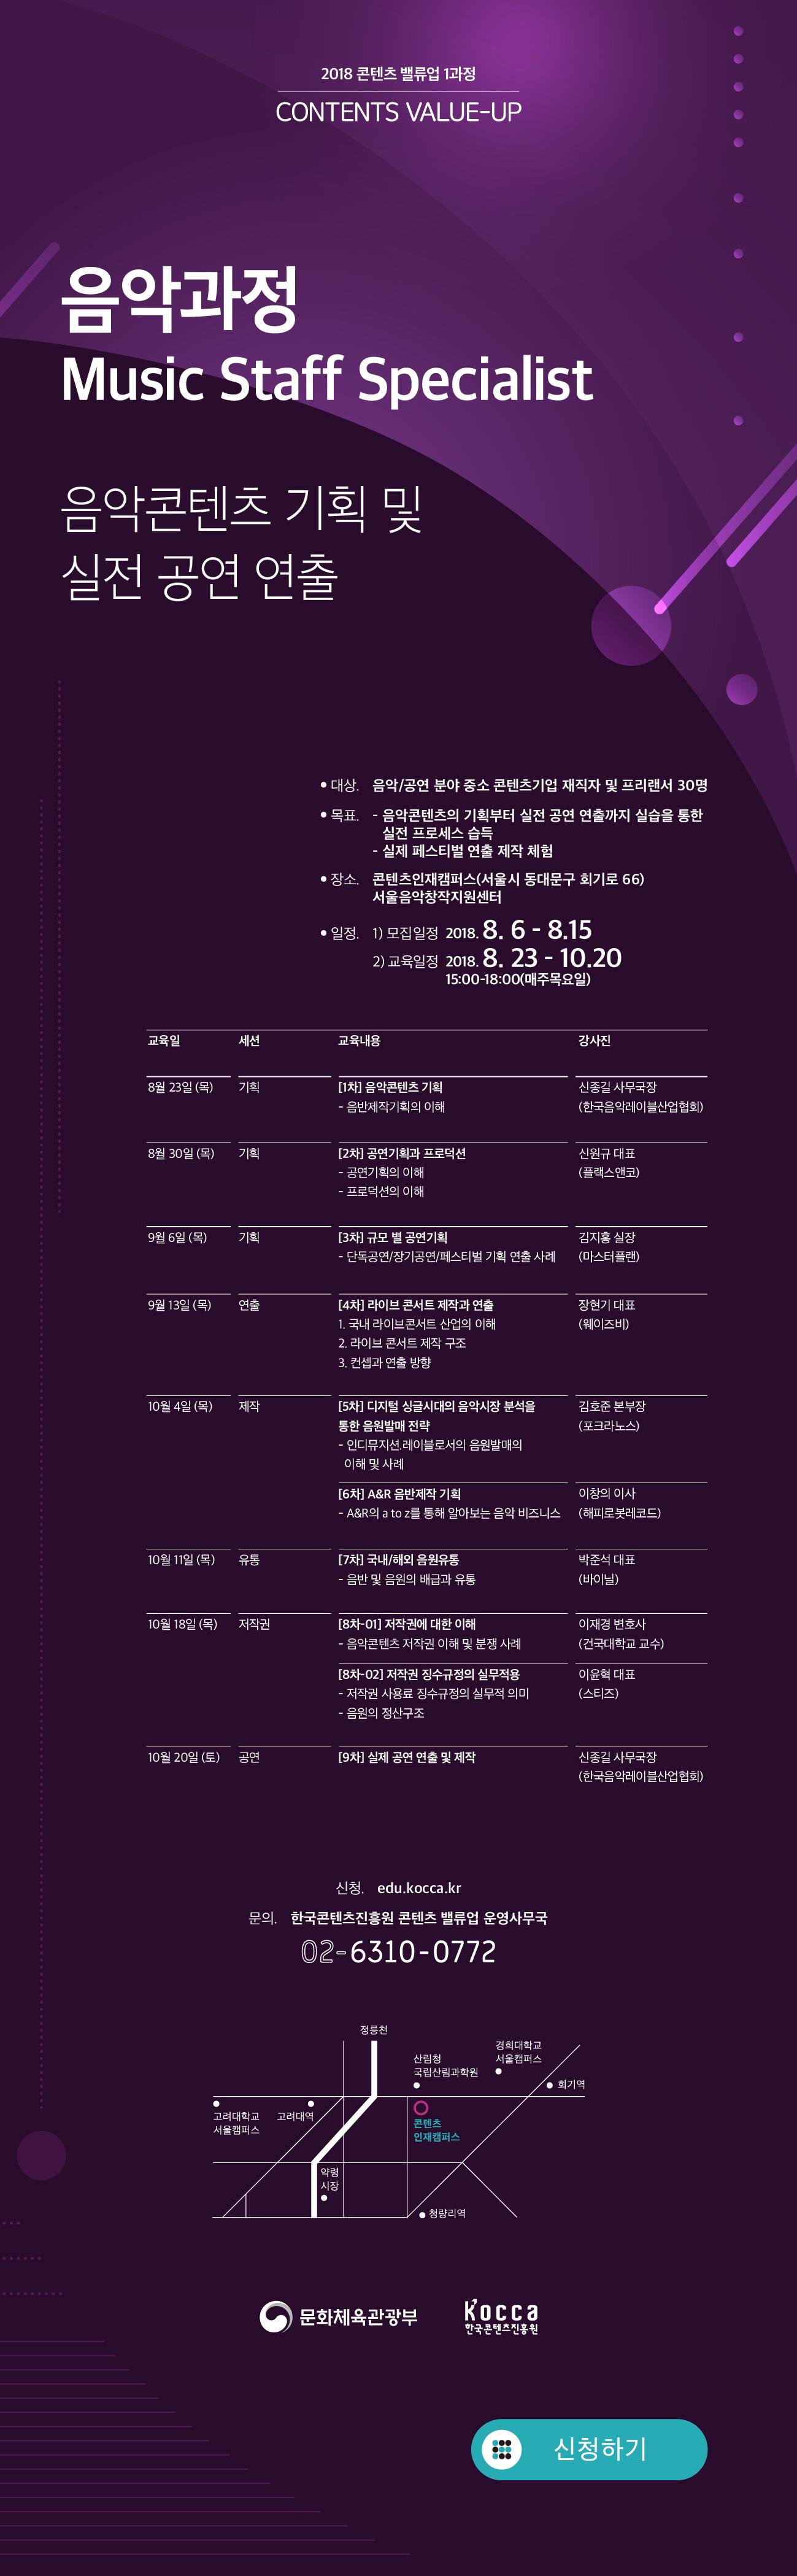 Music Staff Specialist (8차시) 음악콘텐츠 기획 및 실전공연 연출 운영기간 : (모집·선발) 8/3(금) ~ 8/17(금) / (운영) 8/23(목) ~ 10/18(목) 전담코치 : 신종길 사무국장 (음악레이블산업협회) 주요목표 : 실제 공연 연출·제작을 위한 '공연제작프로젝트' 진행 교육장소 : 한국콘텐츠진흥원 콘텐츠인재캠퍼스 등 교육일정  [1차] 음악콘텐츠 기획  음반제작기획의 이해  공연기획의 이해 신종길 국장(음악레이블산업협회) [2차] 공연기획과 프로덕션  공연기획의 이해  프로덕션의 이해 신원규 대표(플래스앤코) [3차] 규모 별 공연기획  단독공연/장기공연/페스티벌 기획 연출 사례 김지홍 실장 (마스터플랜) [4차] 라이브 콘서트 제작과 연출  국내 라이브콘서트 산업의 이해 라이브 콘서트 제작 구조  컨셉과 연출 방향 장현기 대표(웨이즈비) [5차] 디지털 싱글시대의 음악시장 분석을 통한 음원발매 전략  인디뮤지션.레이블로서의 음원발매의 이해 및 사례 김호준 본부장 (포크라노스) [6차] A&R 음반제작 기획  A&R의 a to z를 통해 알아보는 음악 비즈니스 이창의 이사(해피로봇레코드) [7차] 국내/해외 음원유통  음반 및 음원의 배급과 유통 박준석 대표(바이닐) [8차_1] 저작권에 대한 이해  음악콘텐츠 저작권 이해 및 분장 사례 이재경 변호사 (이재경 법률사무소) [8차_2] 저작권 징수규정의 실무적용  저작권 사용료 징수규정의 실무적인 의미  음원의 정산구조 이윤혁 대표(스티즈) [공영운영 실습] Mint Fasta 문의처 한국콘텐츠진흥원 콘텐츠밸류업 운영사무국 02 6310 0772